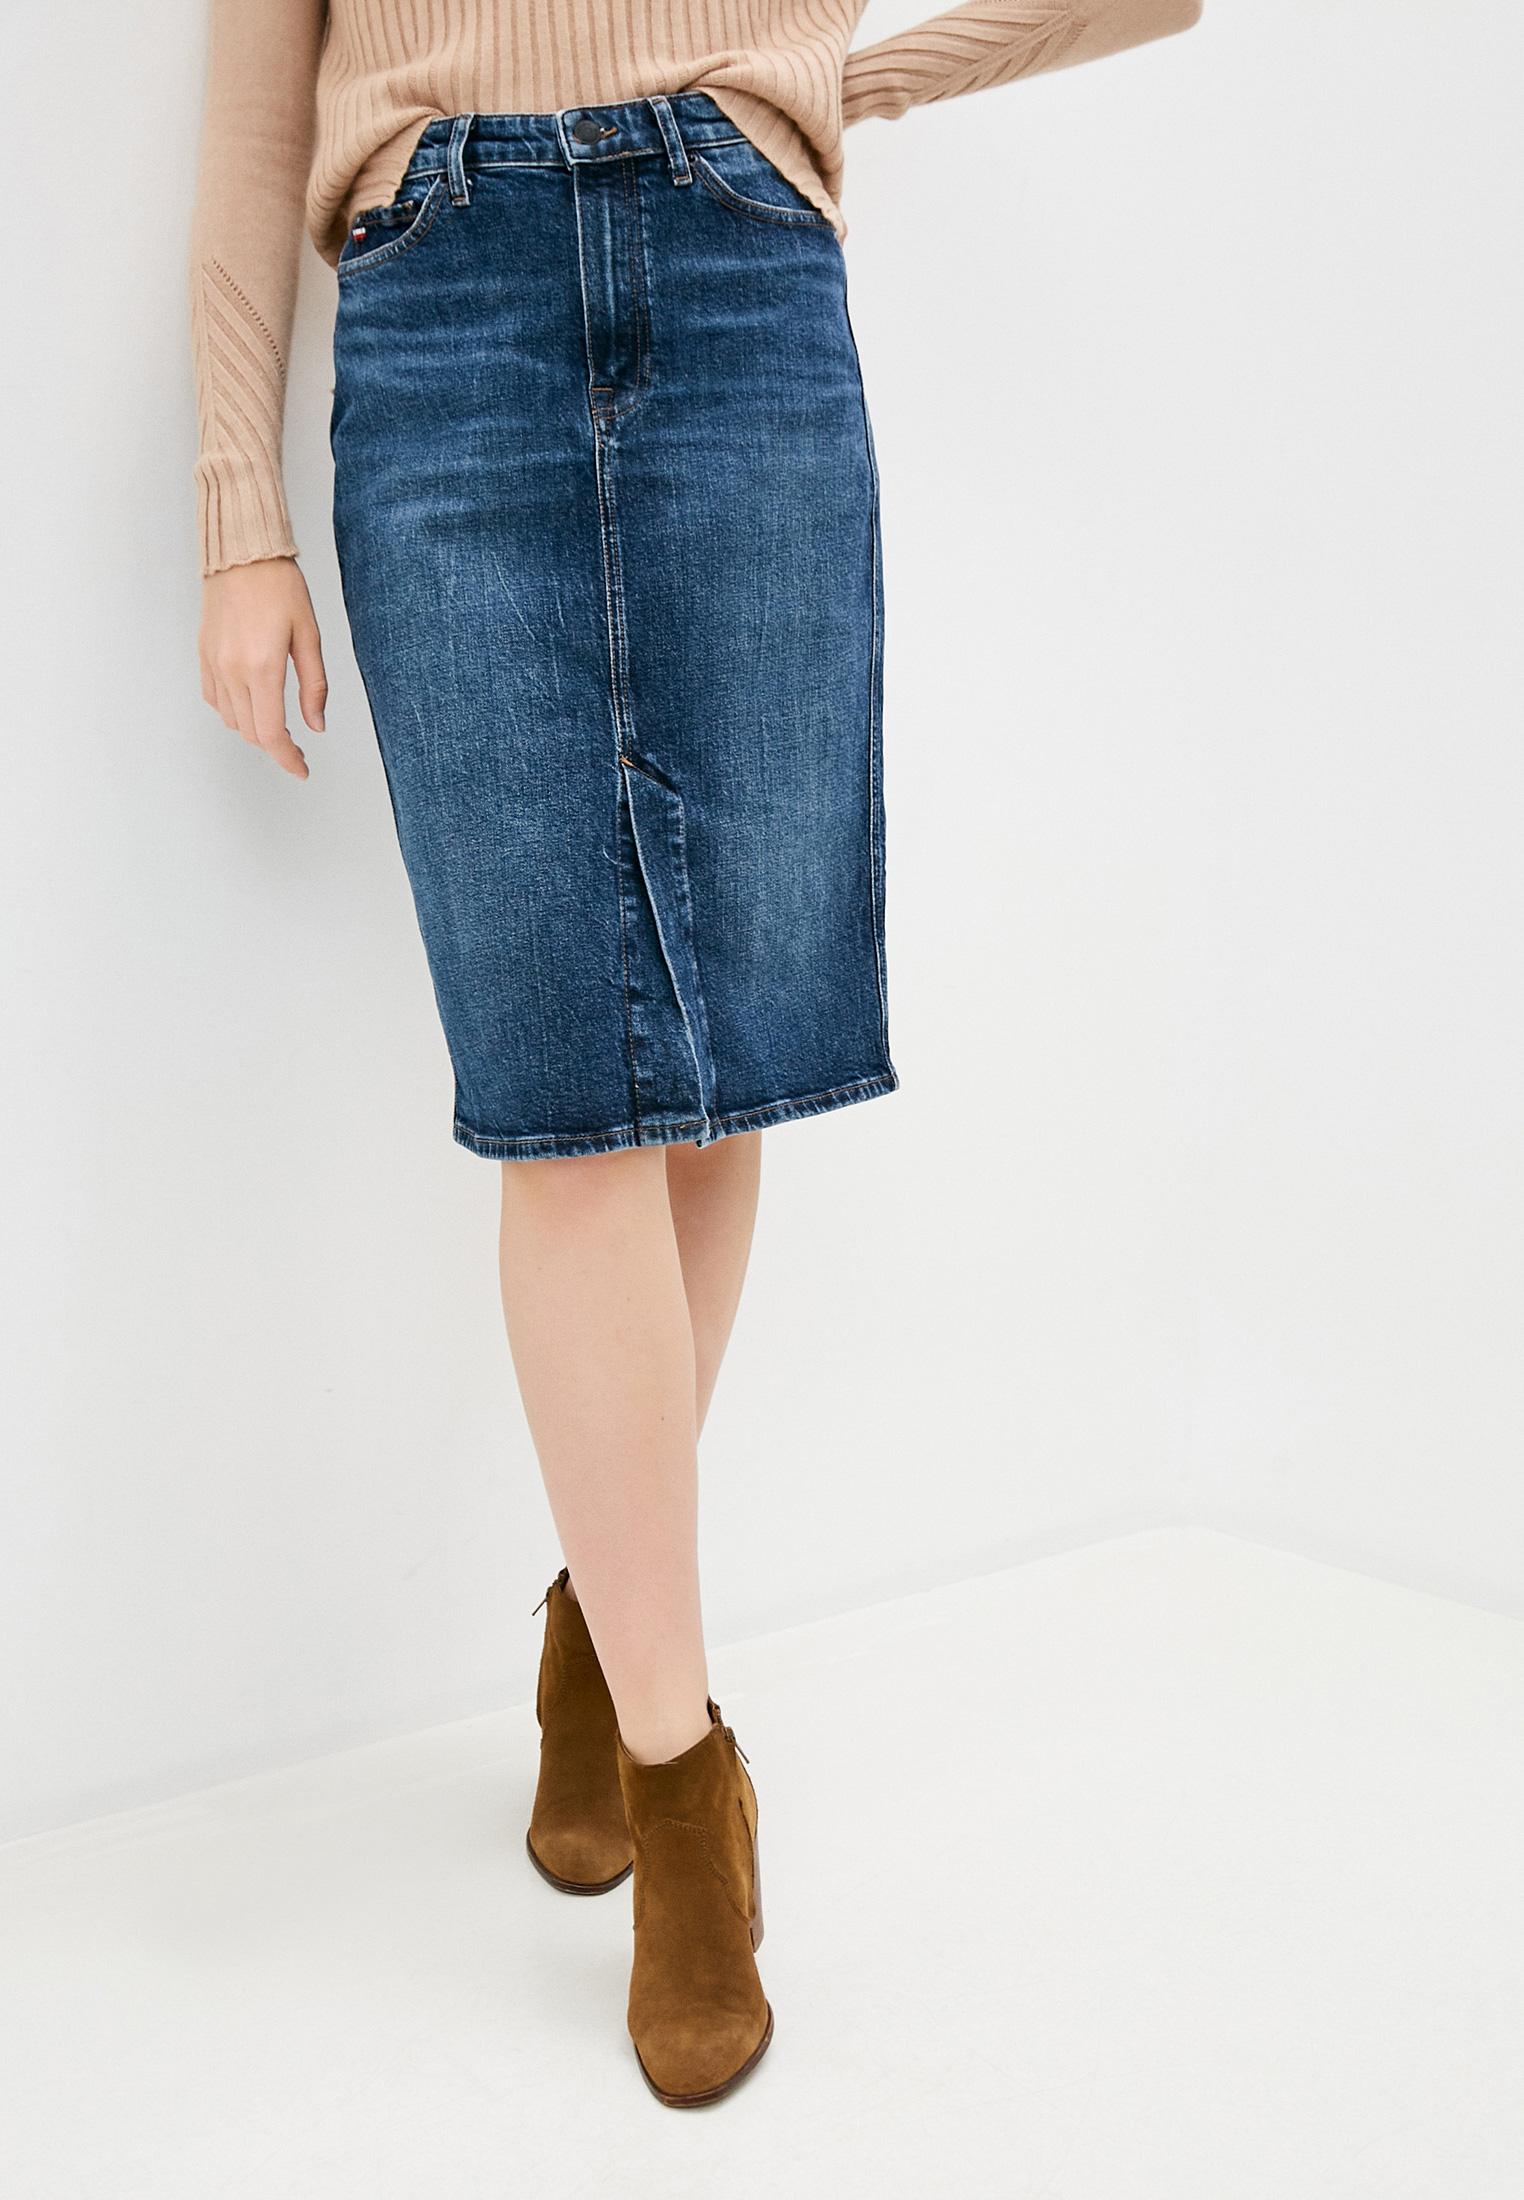 Джинсовая юбка Tommy Hilfiger (Томми Хилфигер) WW0WW28541